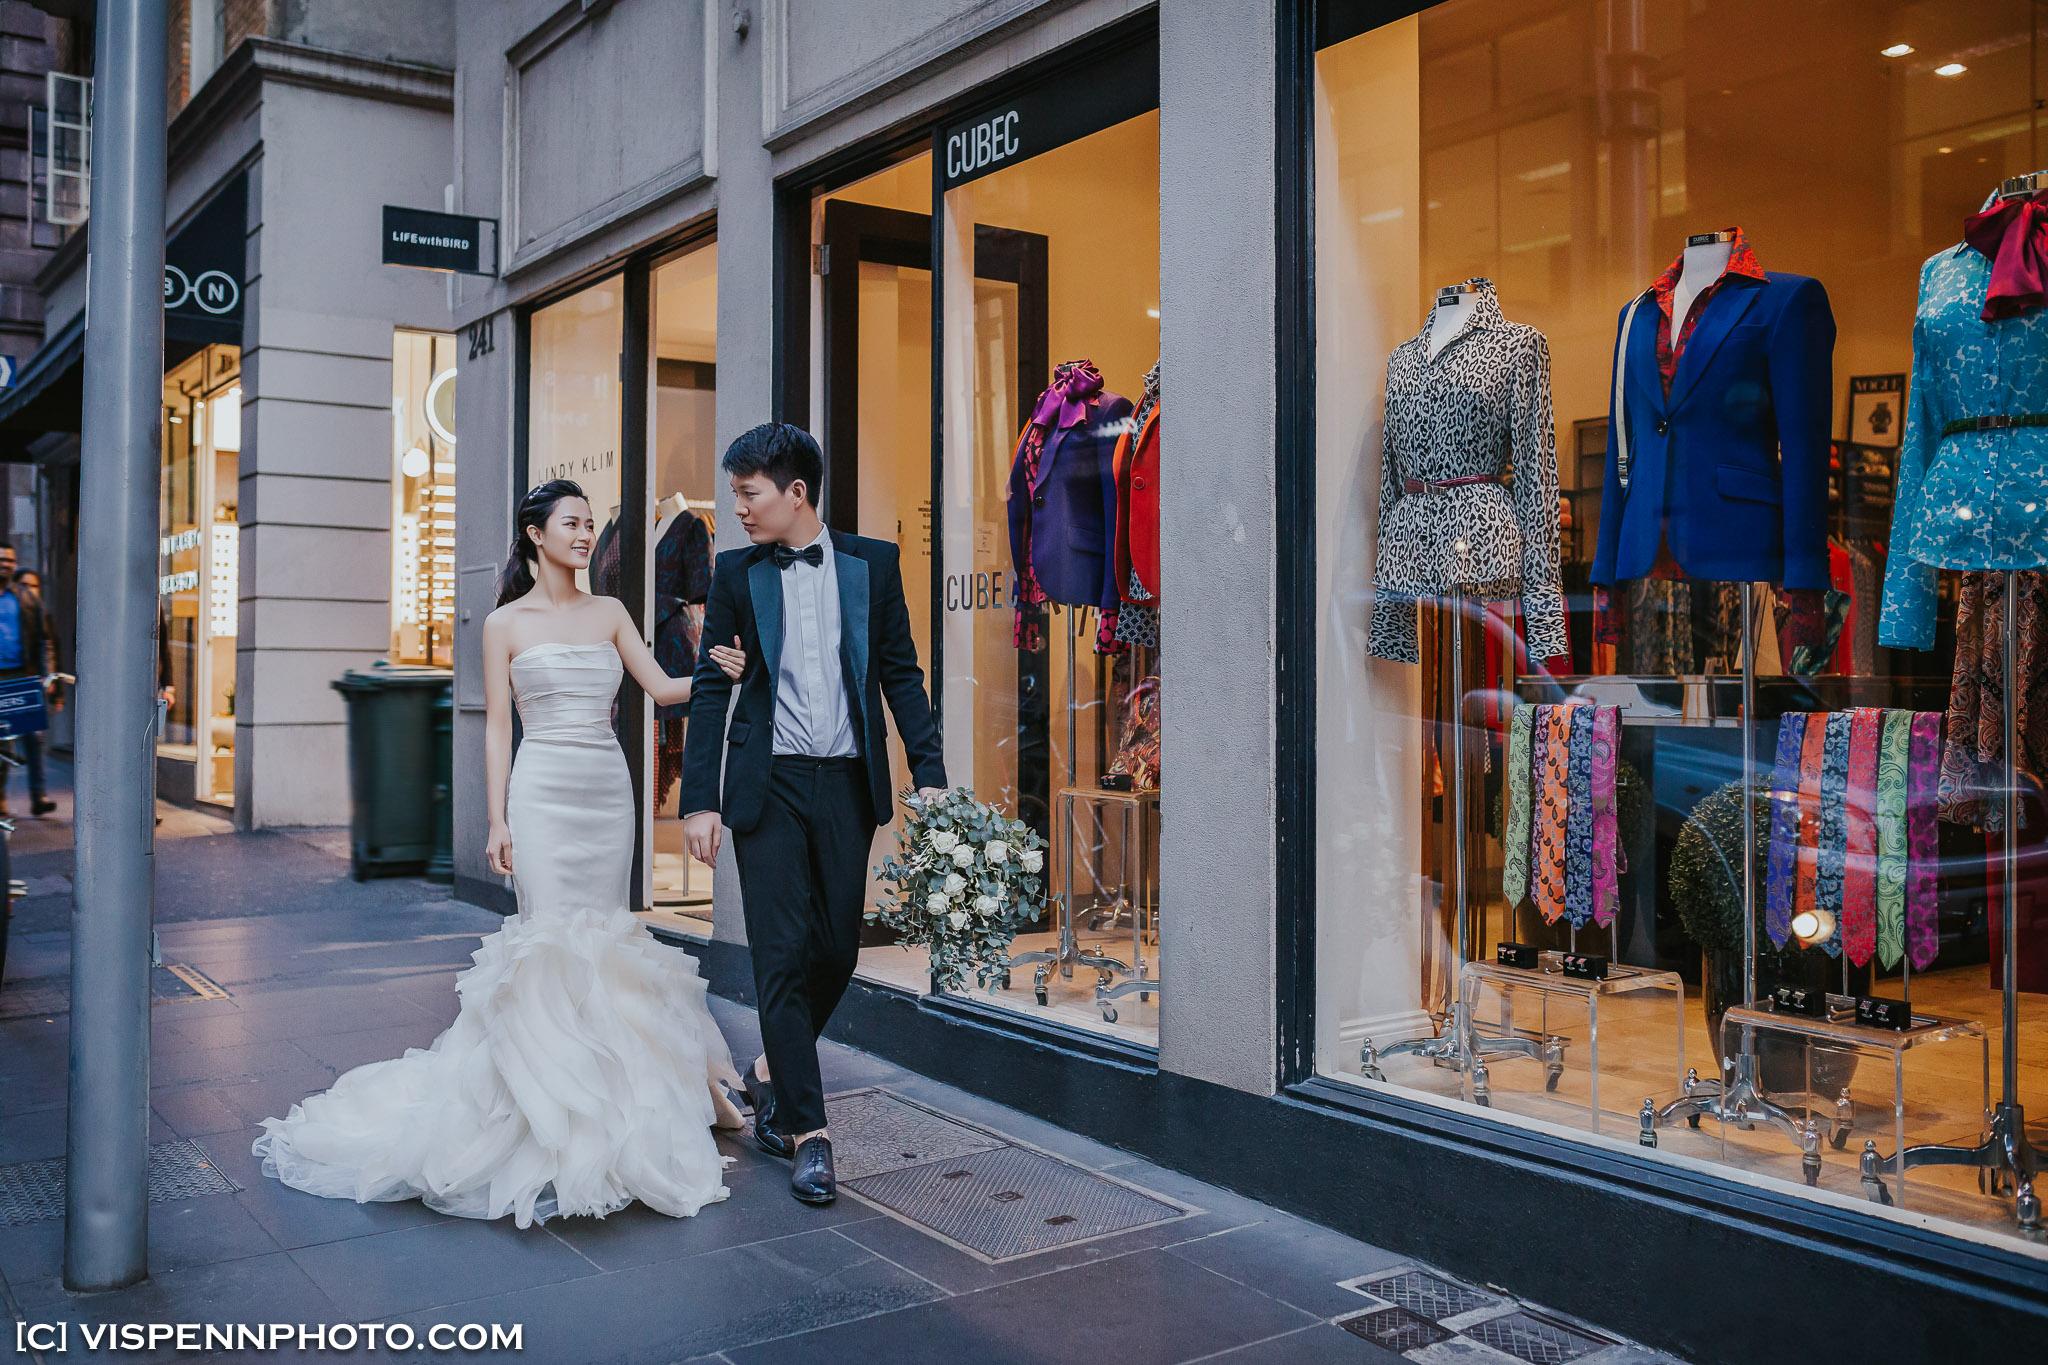 PRE WEDDING Photography Melbourne VISPENN 墨尔本 婚纱照 结婚照 婚纱摄影 VISPENN P5D4 2235